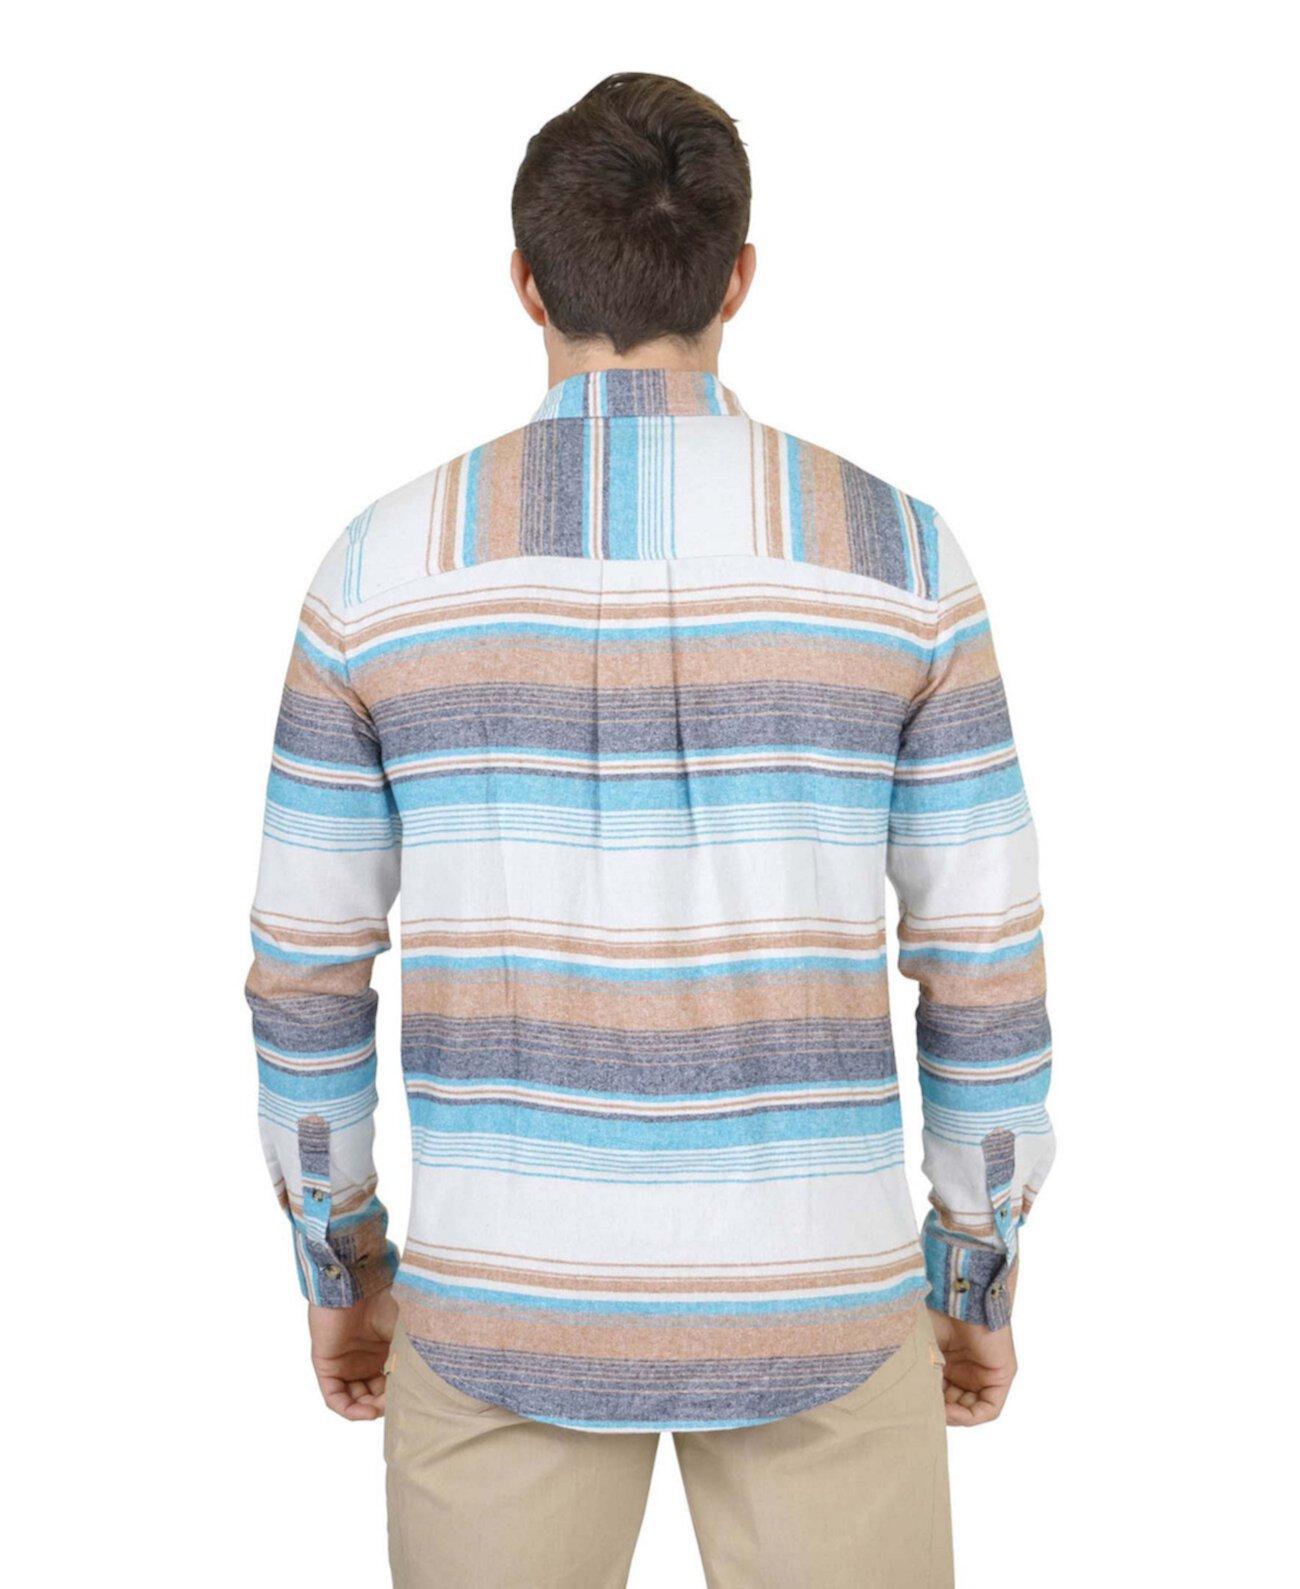 Фланелевая мужская рубашка Baja Mountain And Isles